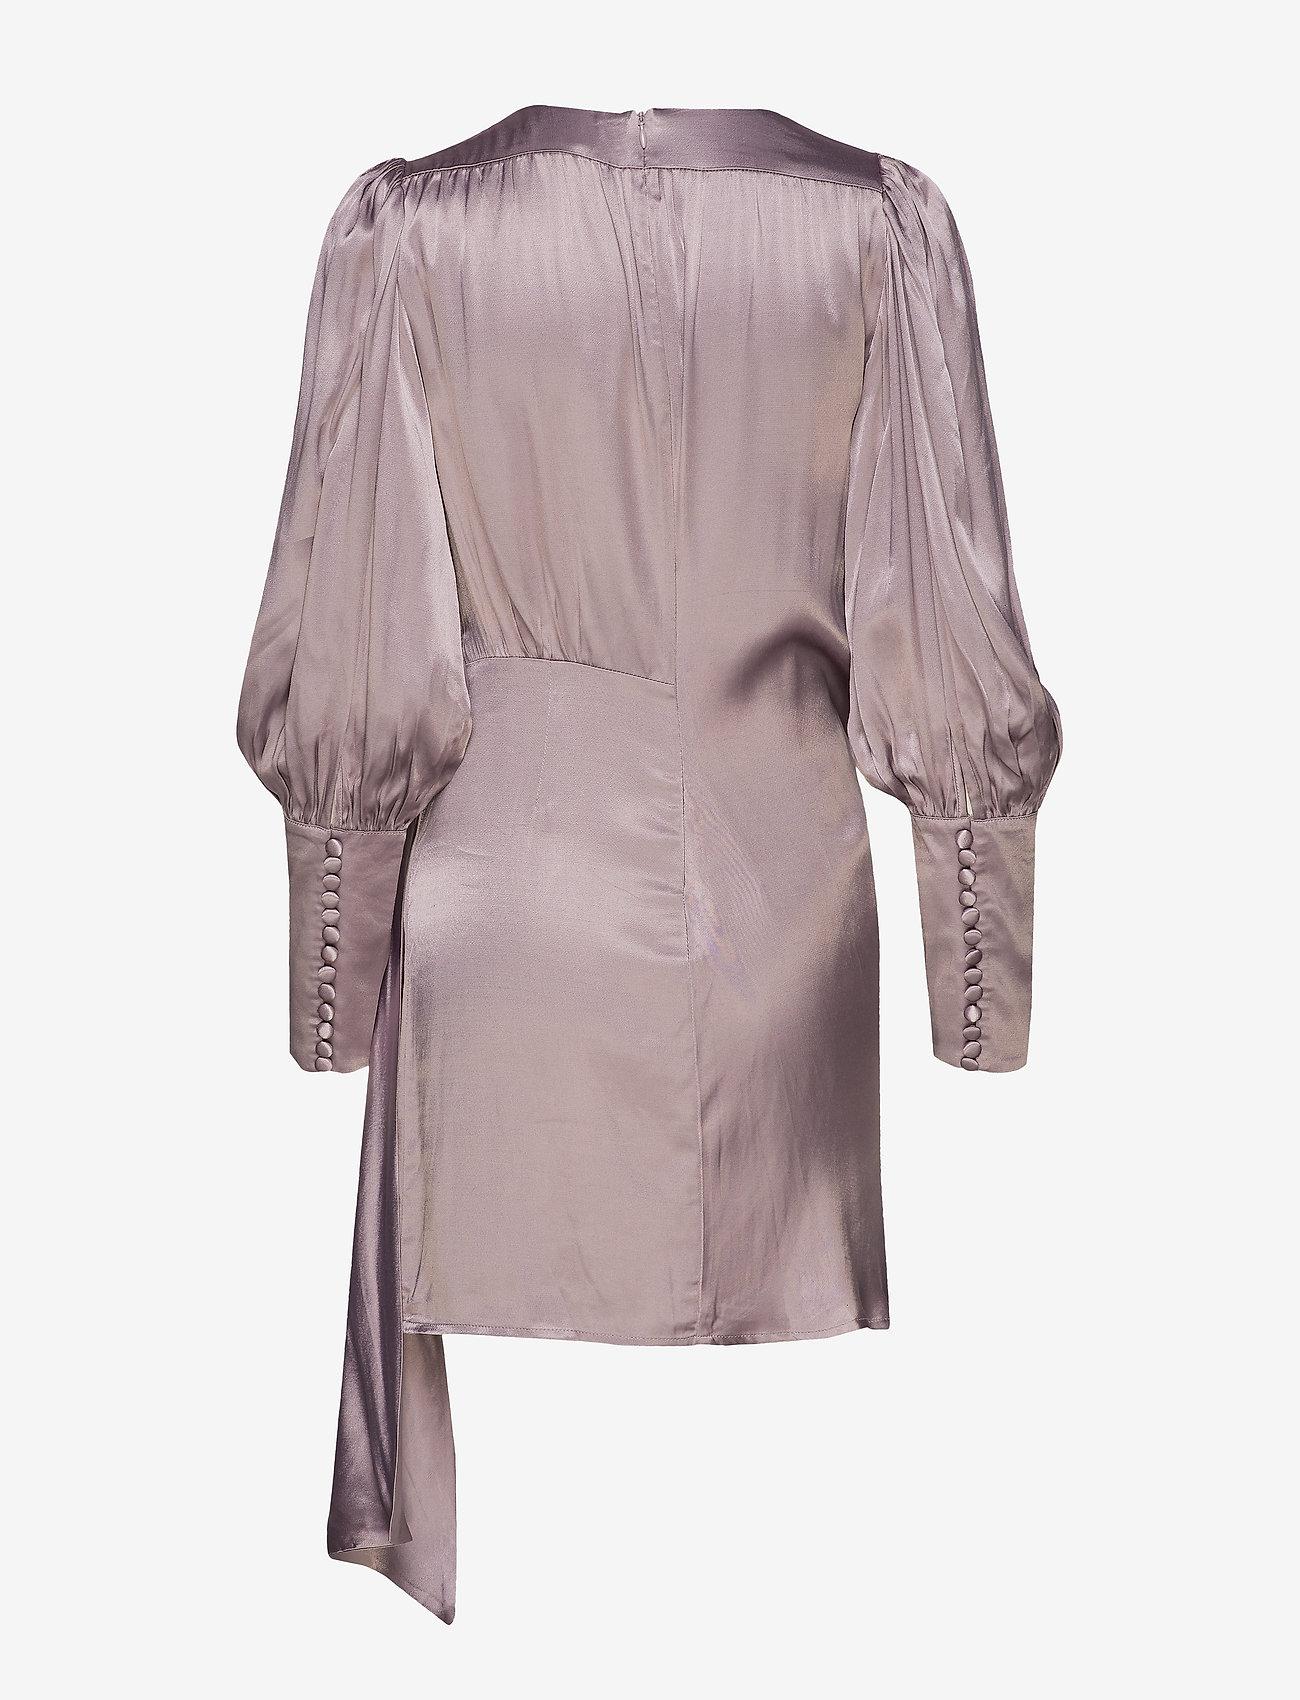 Amanda Dress (Dust Lavender) (124.50 €) - Birgitte Herskind Fs11h